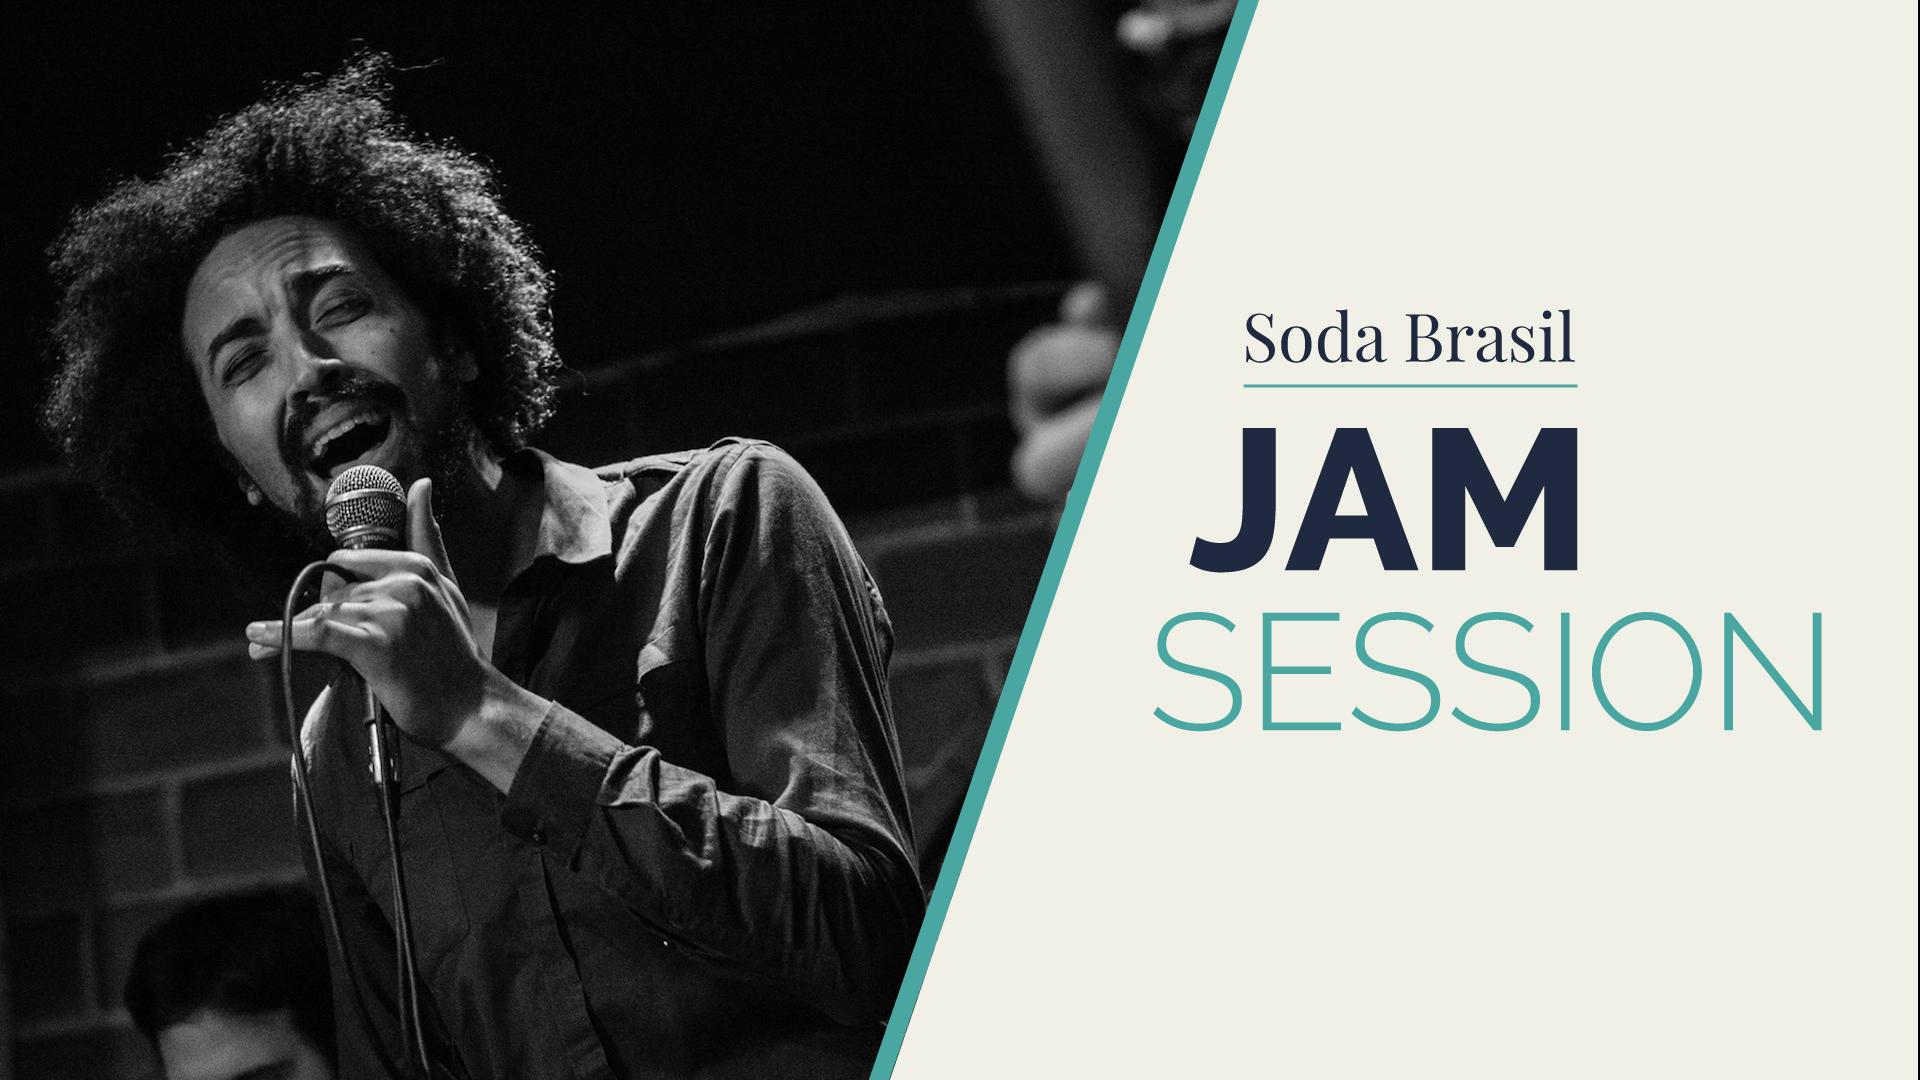 Soda Brazil Jam Session (+ Alan Elvira)